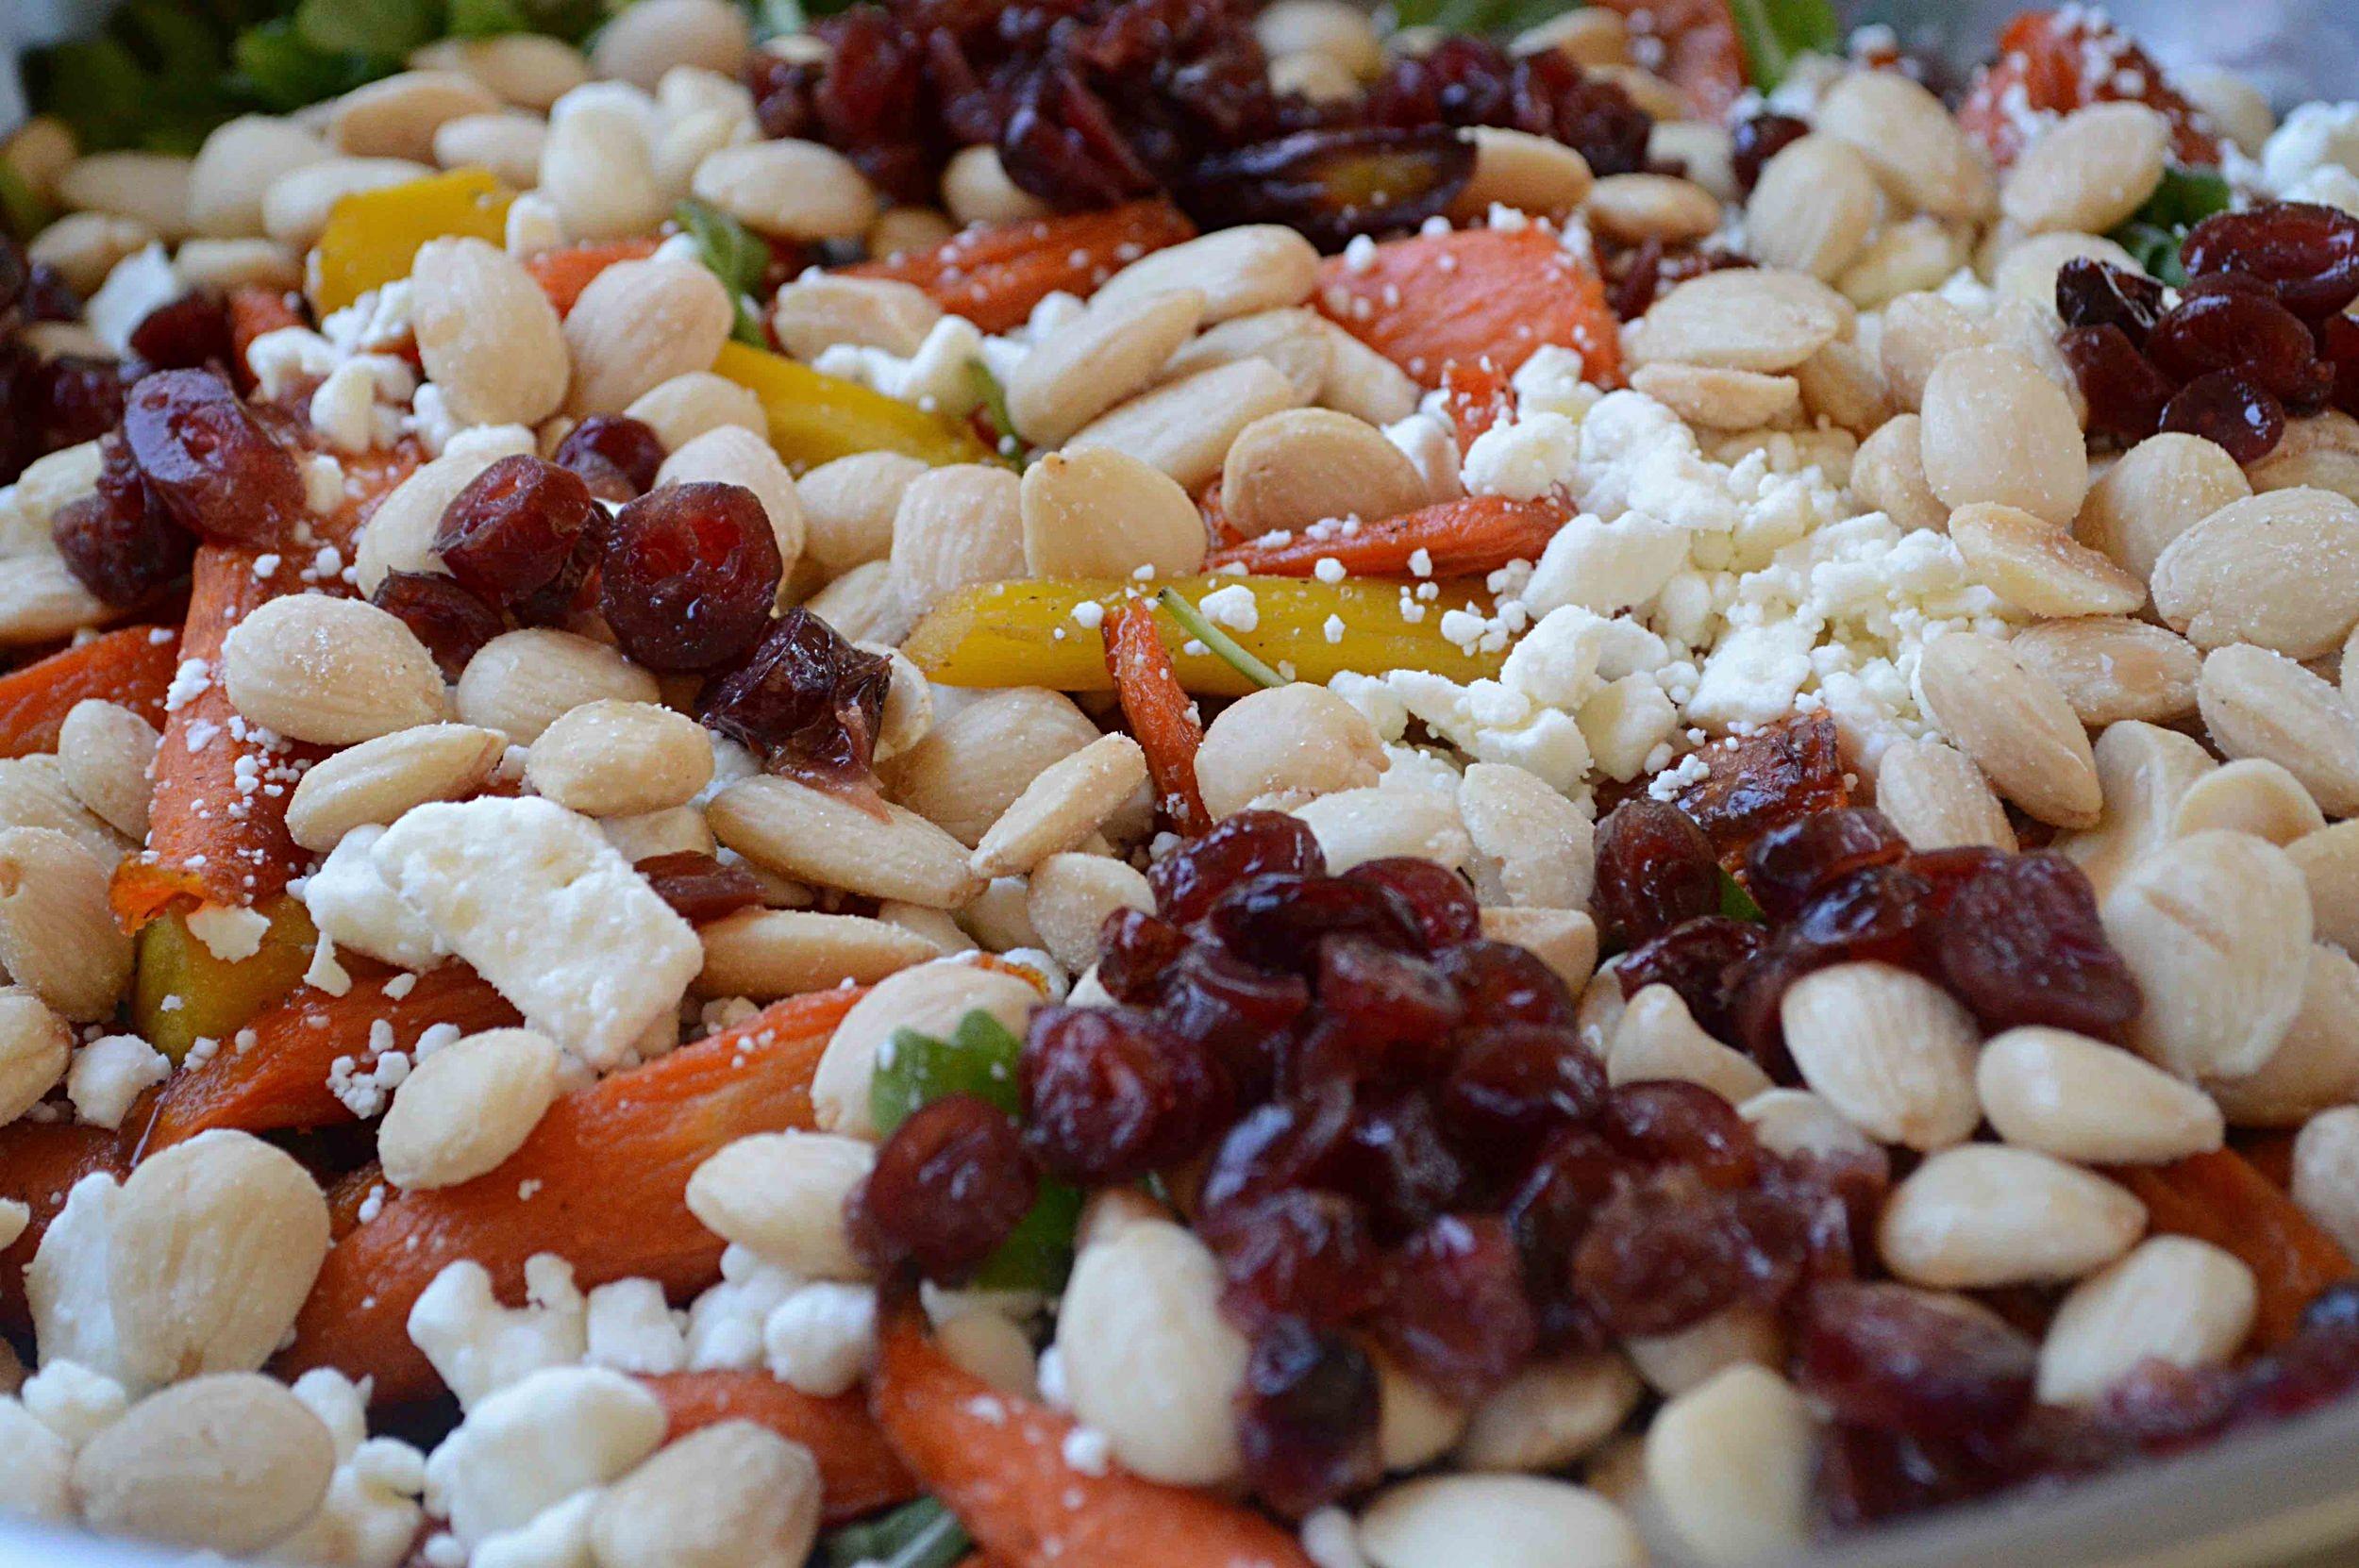 Roasted Carrot, Almond, Craisin, Feta & Arugula Salad